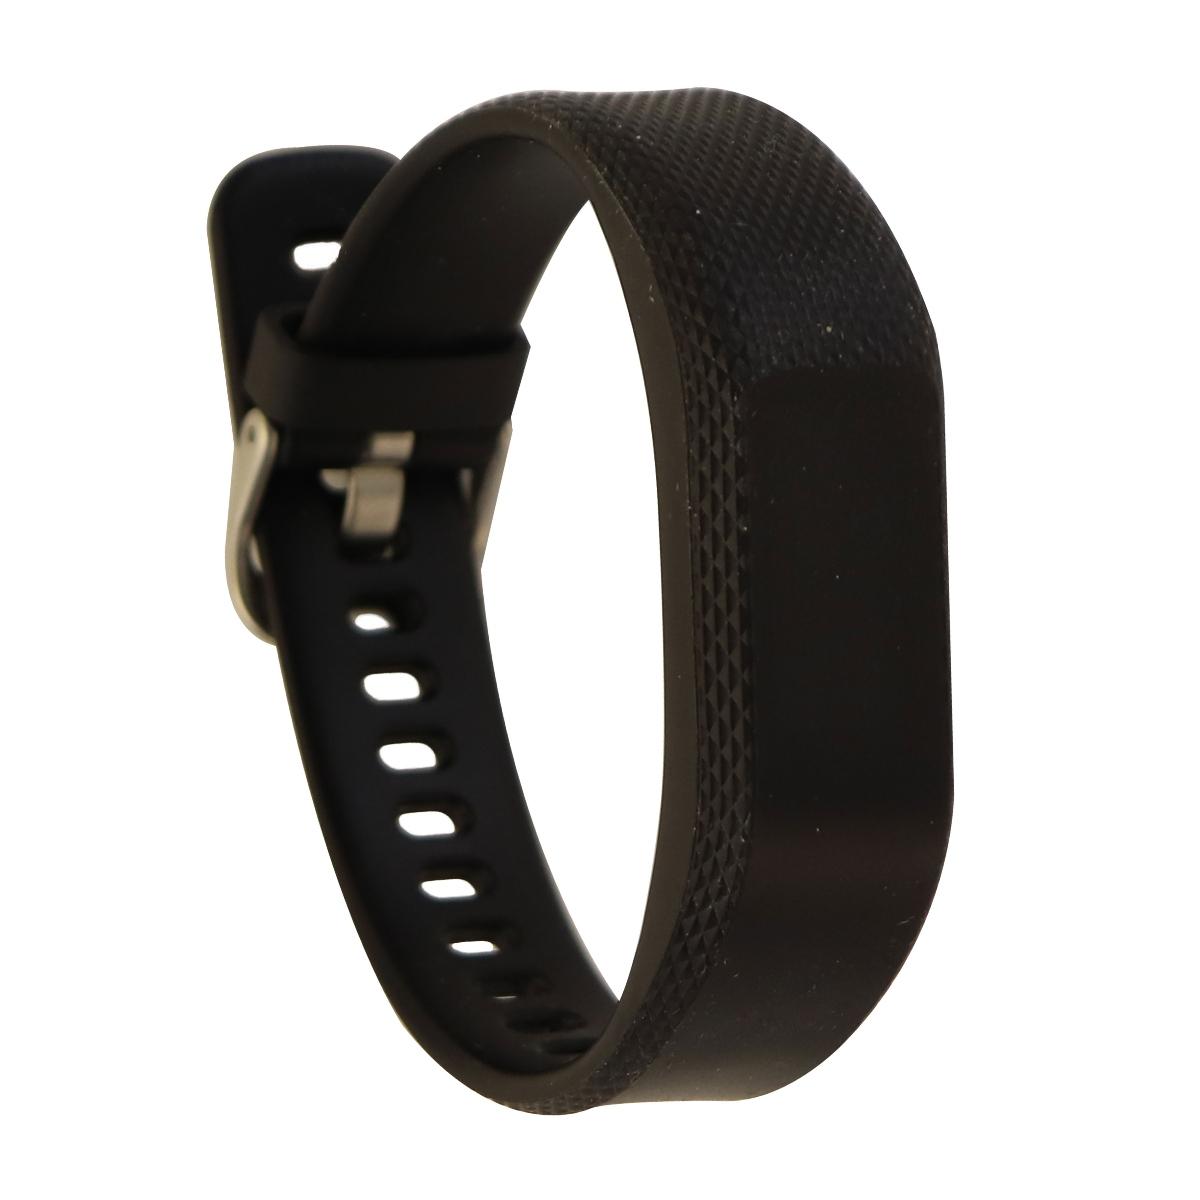 Garmin Vivosmart 3 Fitness Activity Tracker - Black (S / M Size)